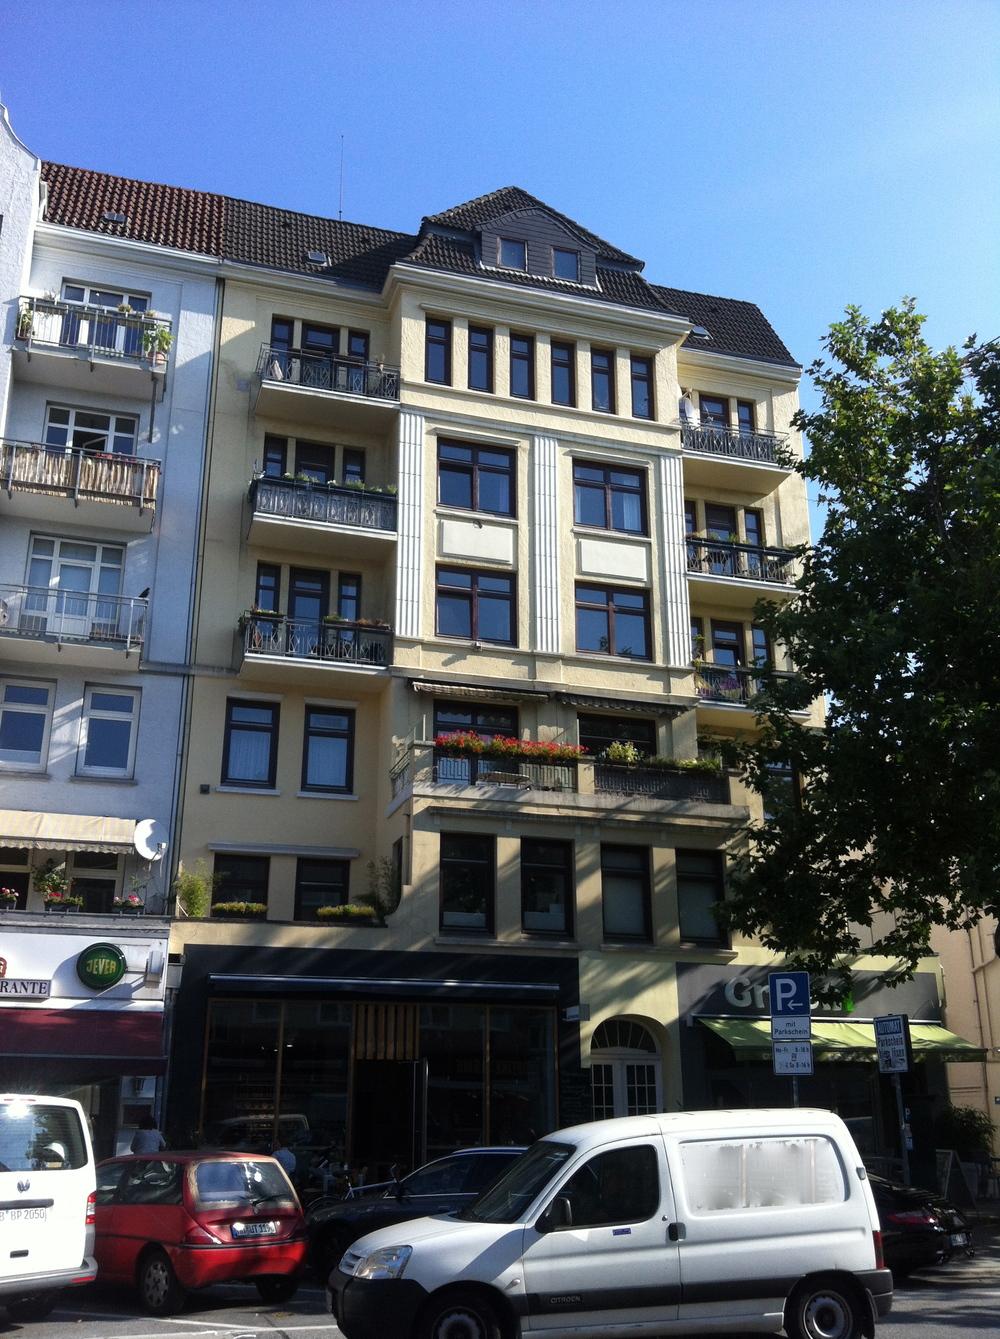 Eimsbüttel, Osterstraße, 16 WE, 2 GE